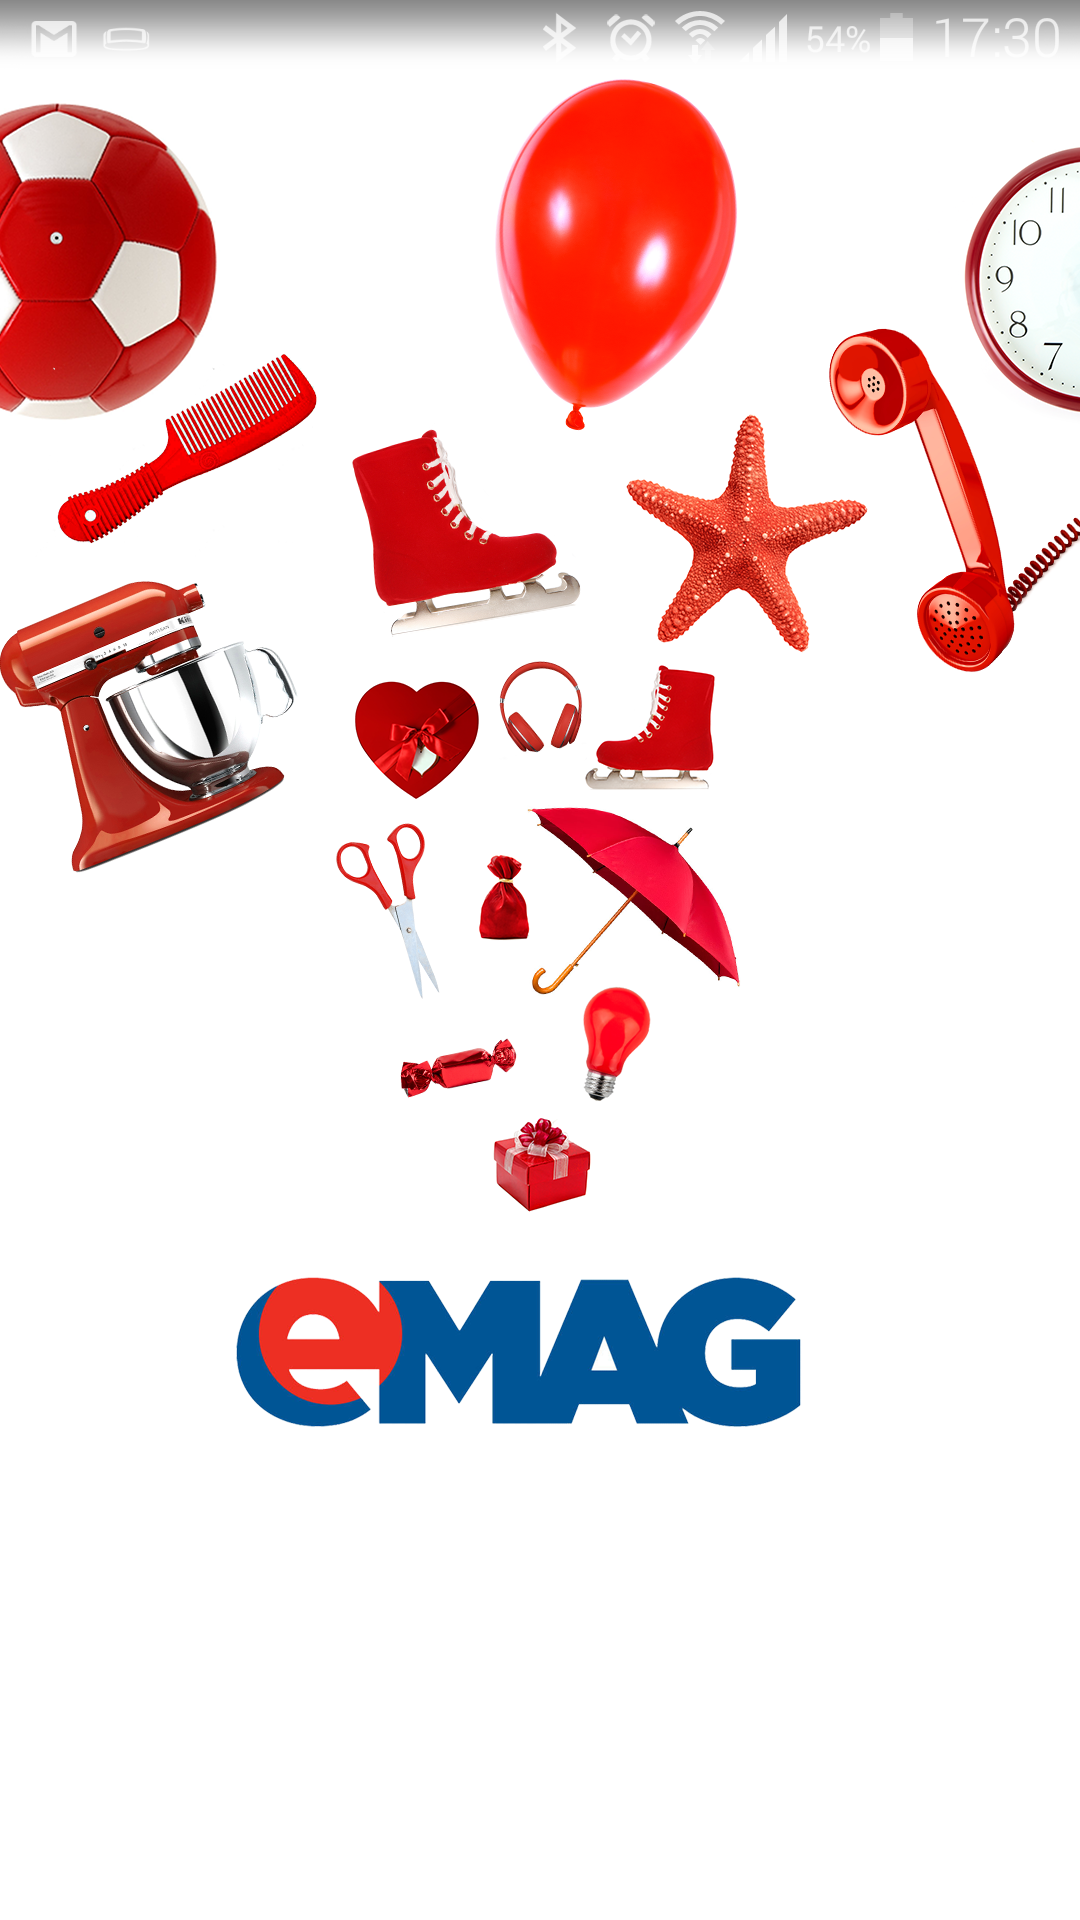 De ce trebuie sa aveti instalata aplicatia eMAG pentru telefonul mobil